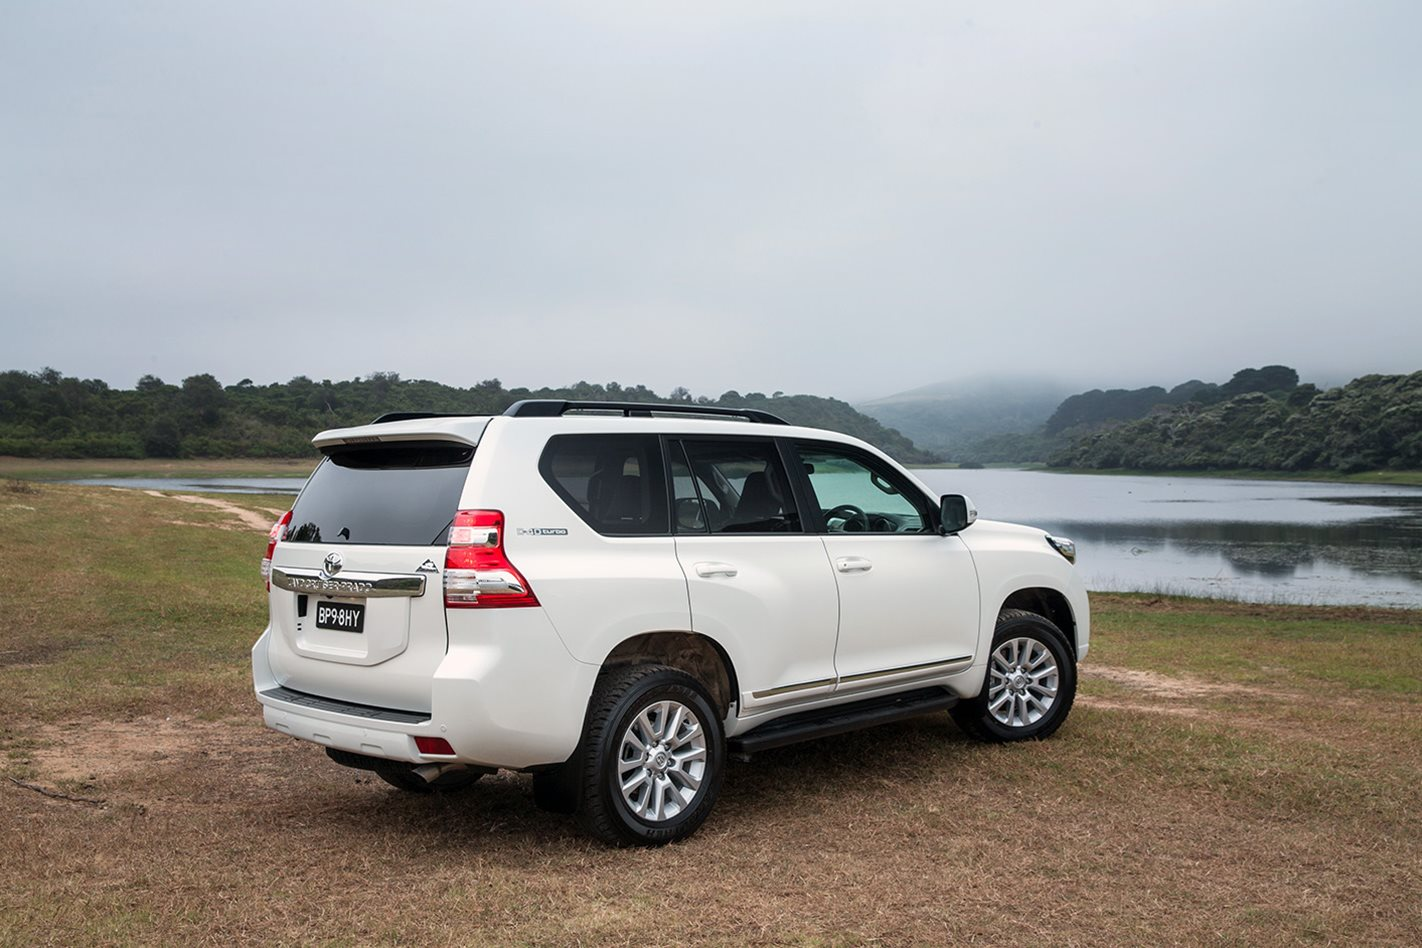 Toyota brings back the popular altitude prado